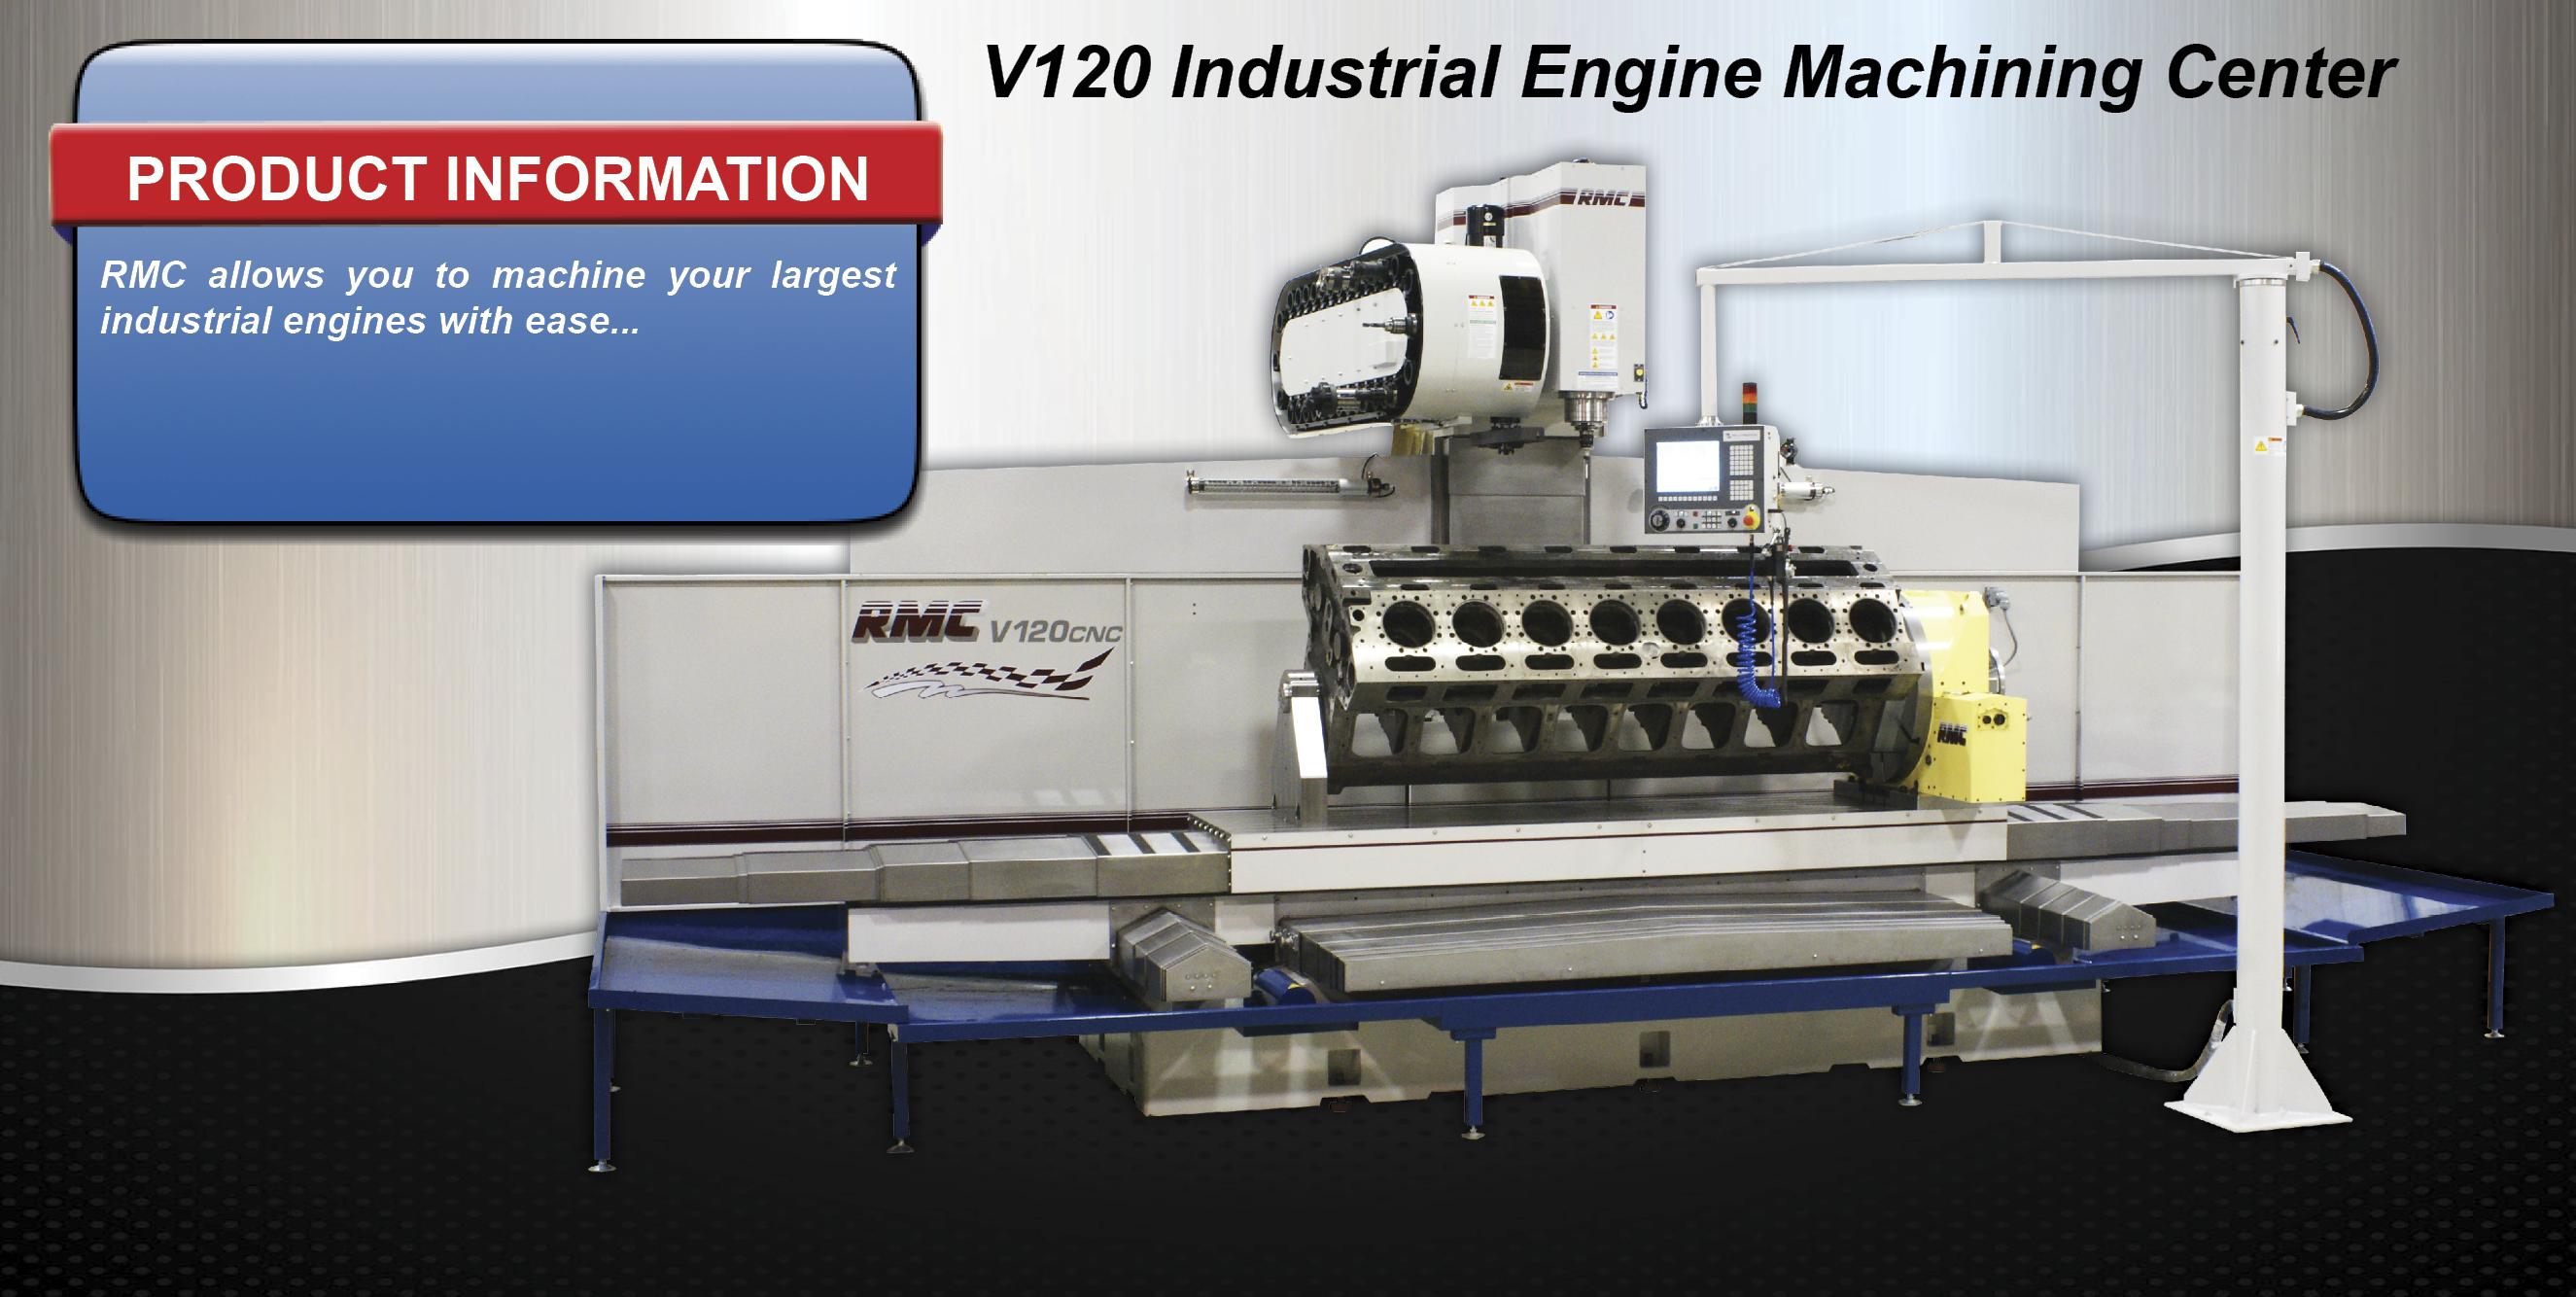 V120-1